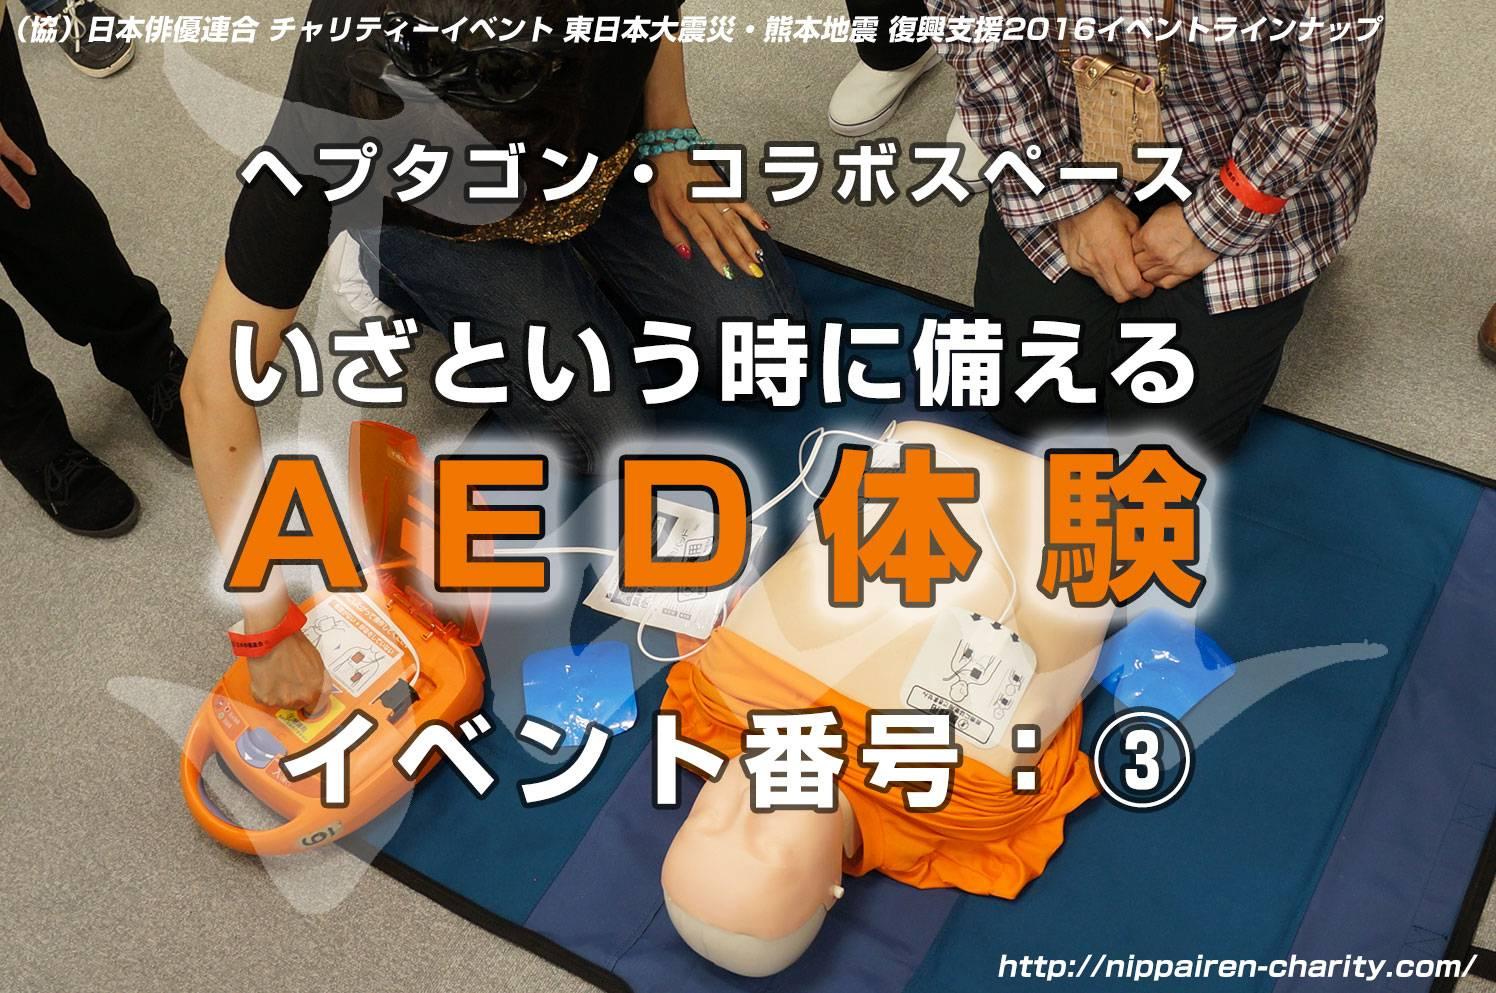 AEDでの救命装置を体験! 『AED体験』